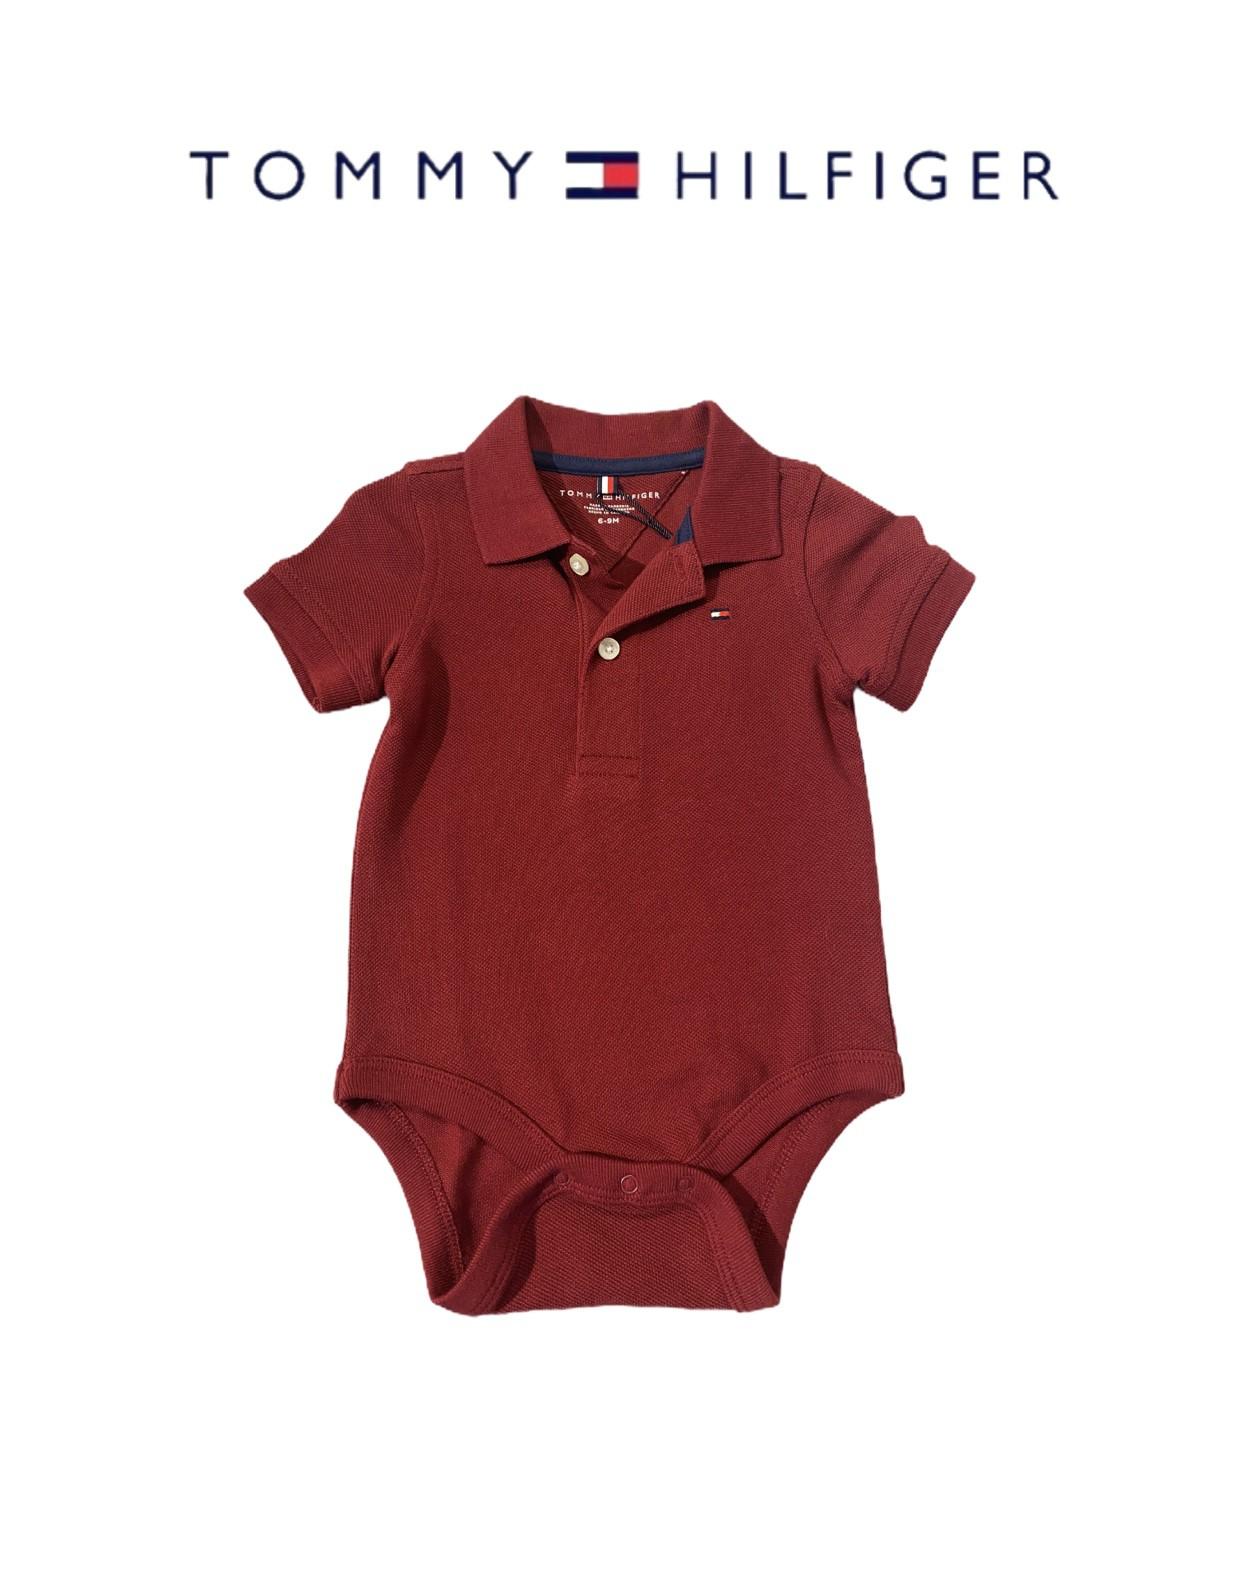 POLO BODY TOMMY HILFIGER® VINHO